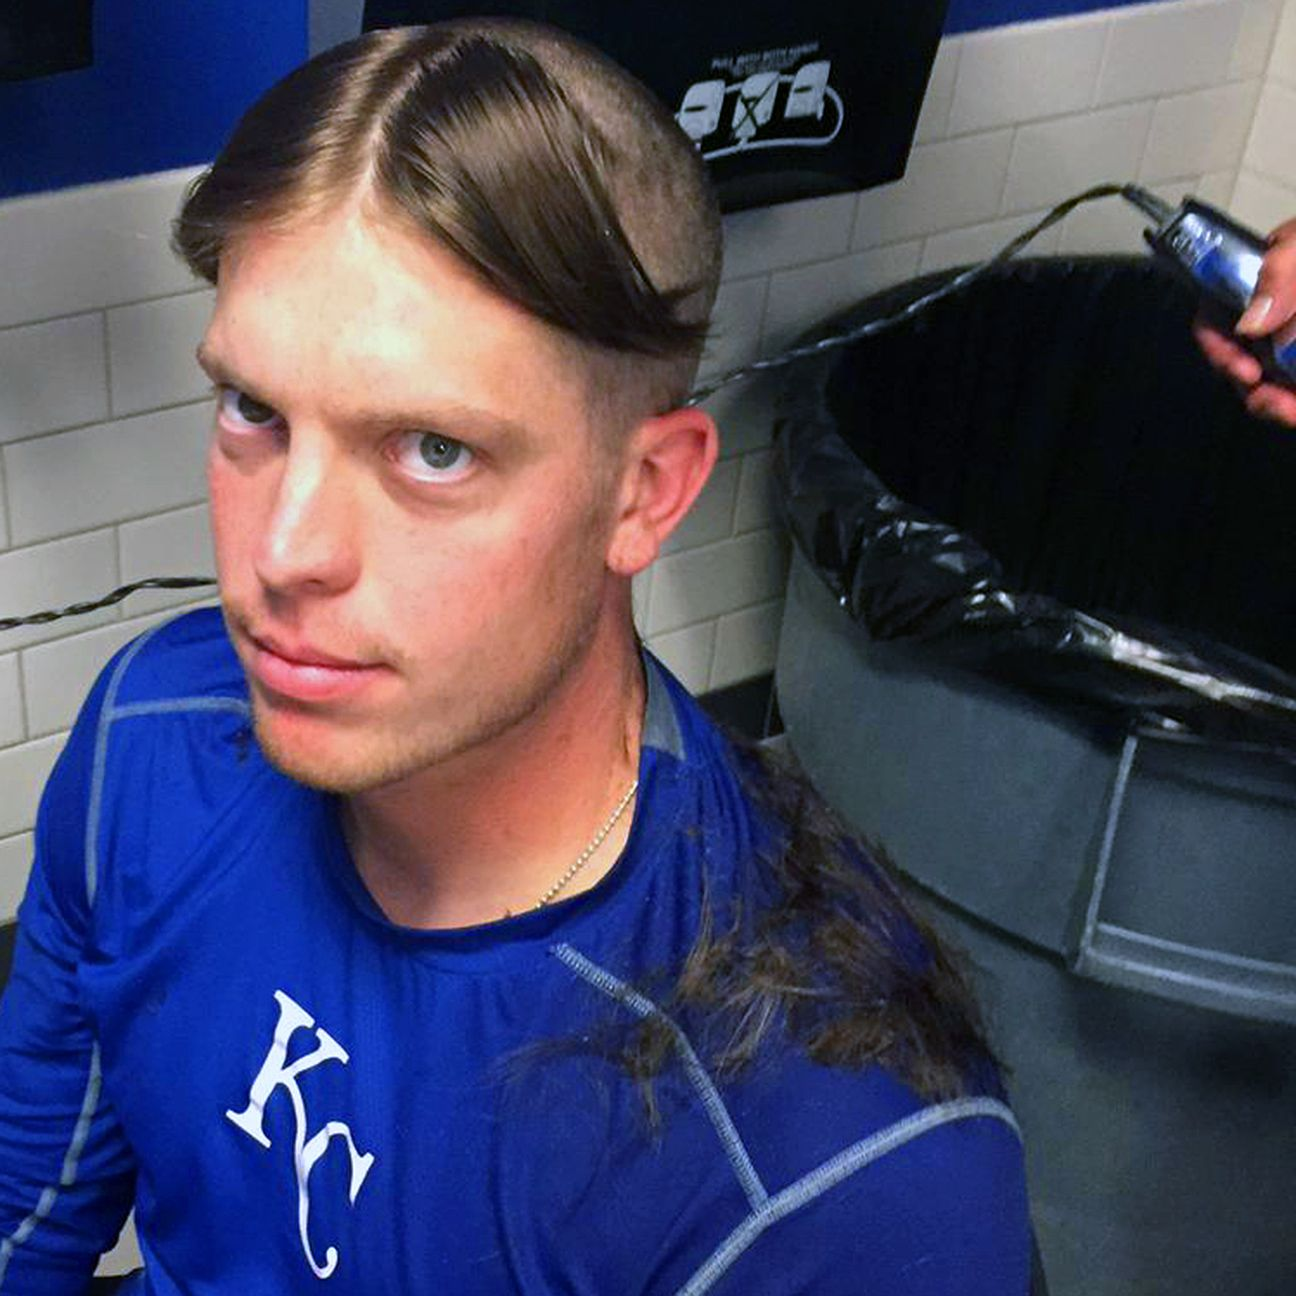 Minor leaguer Buddy Baumann gets unfortunate haircut after losing a ...